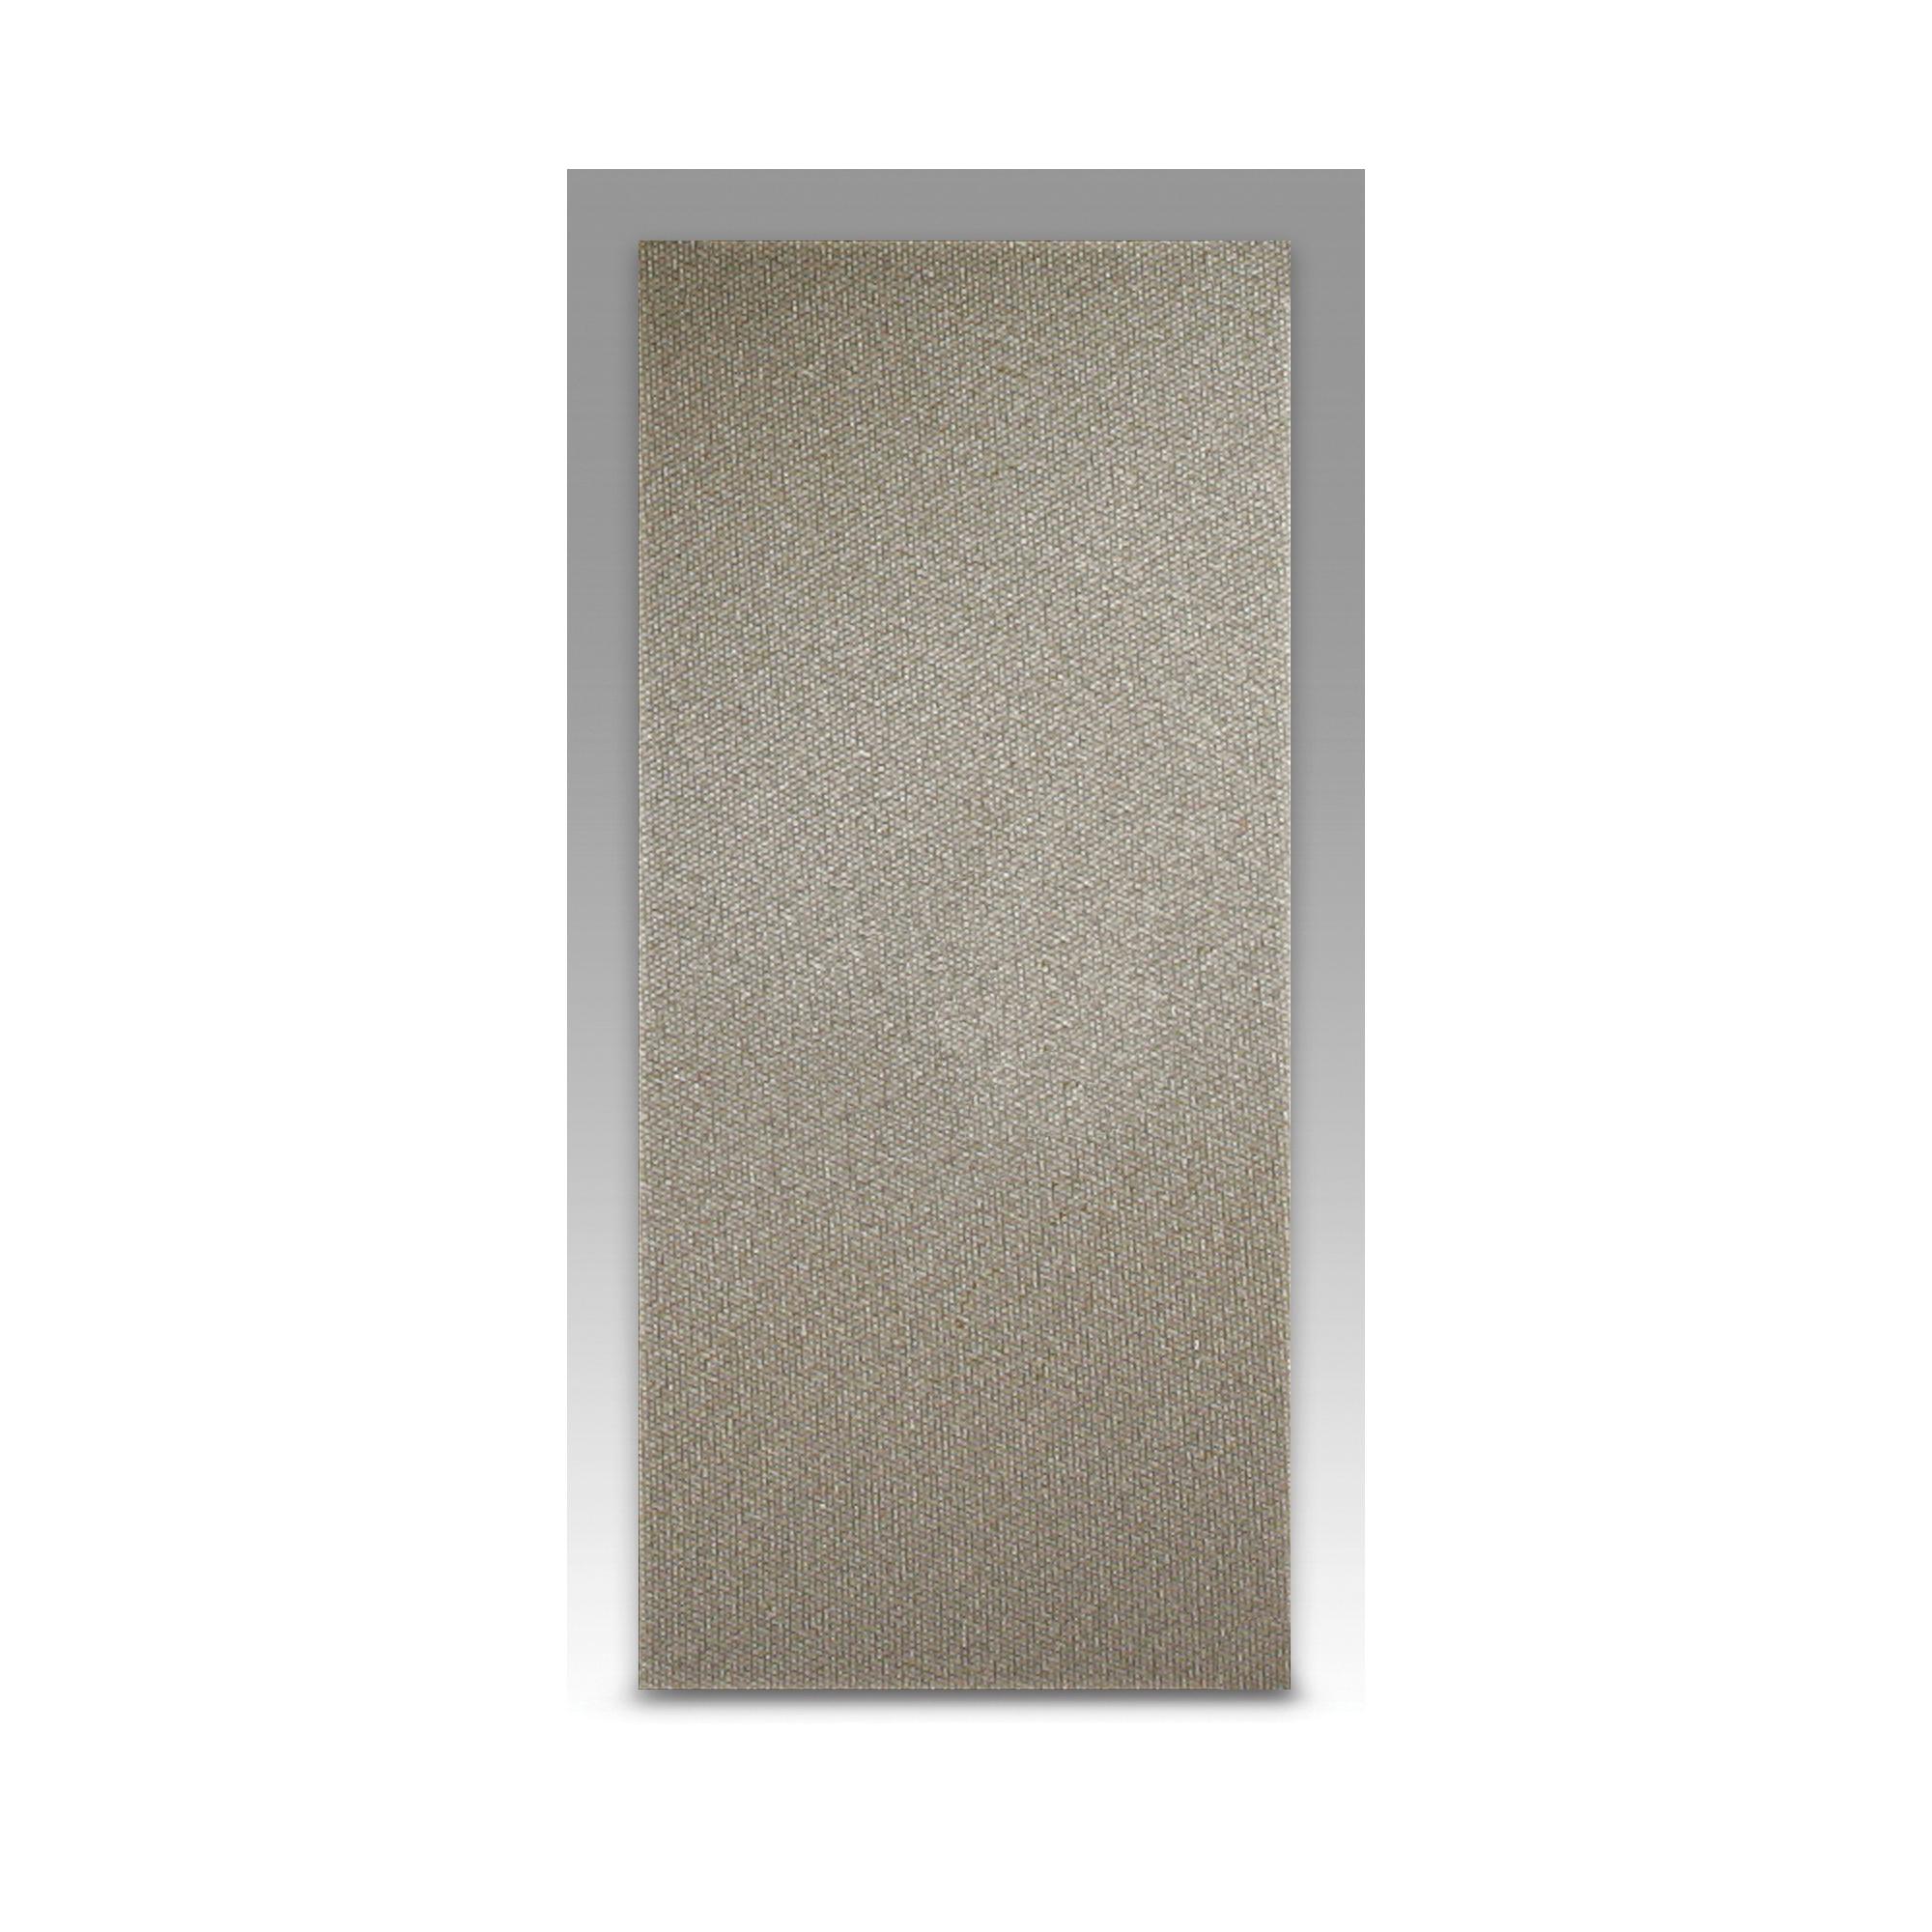 3M™ 051111-54584 6002J Lapping Film Sheet, 5 in L x 2-1/4 in W, M250 Grit, Diamond Abrasive, Green